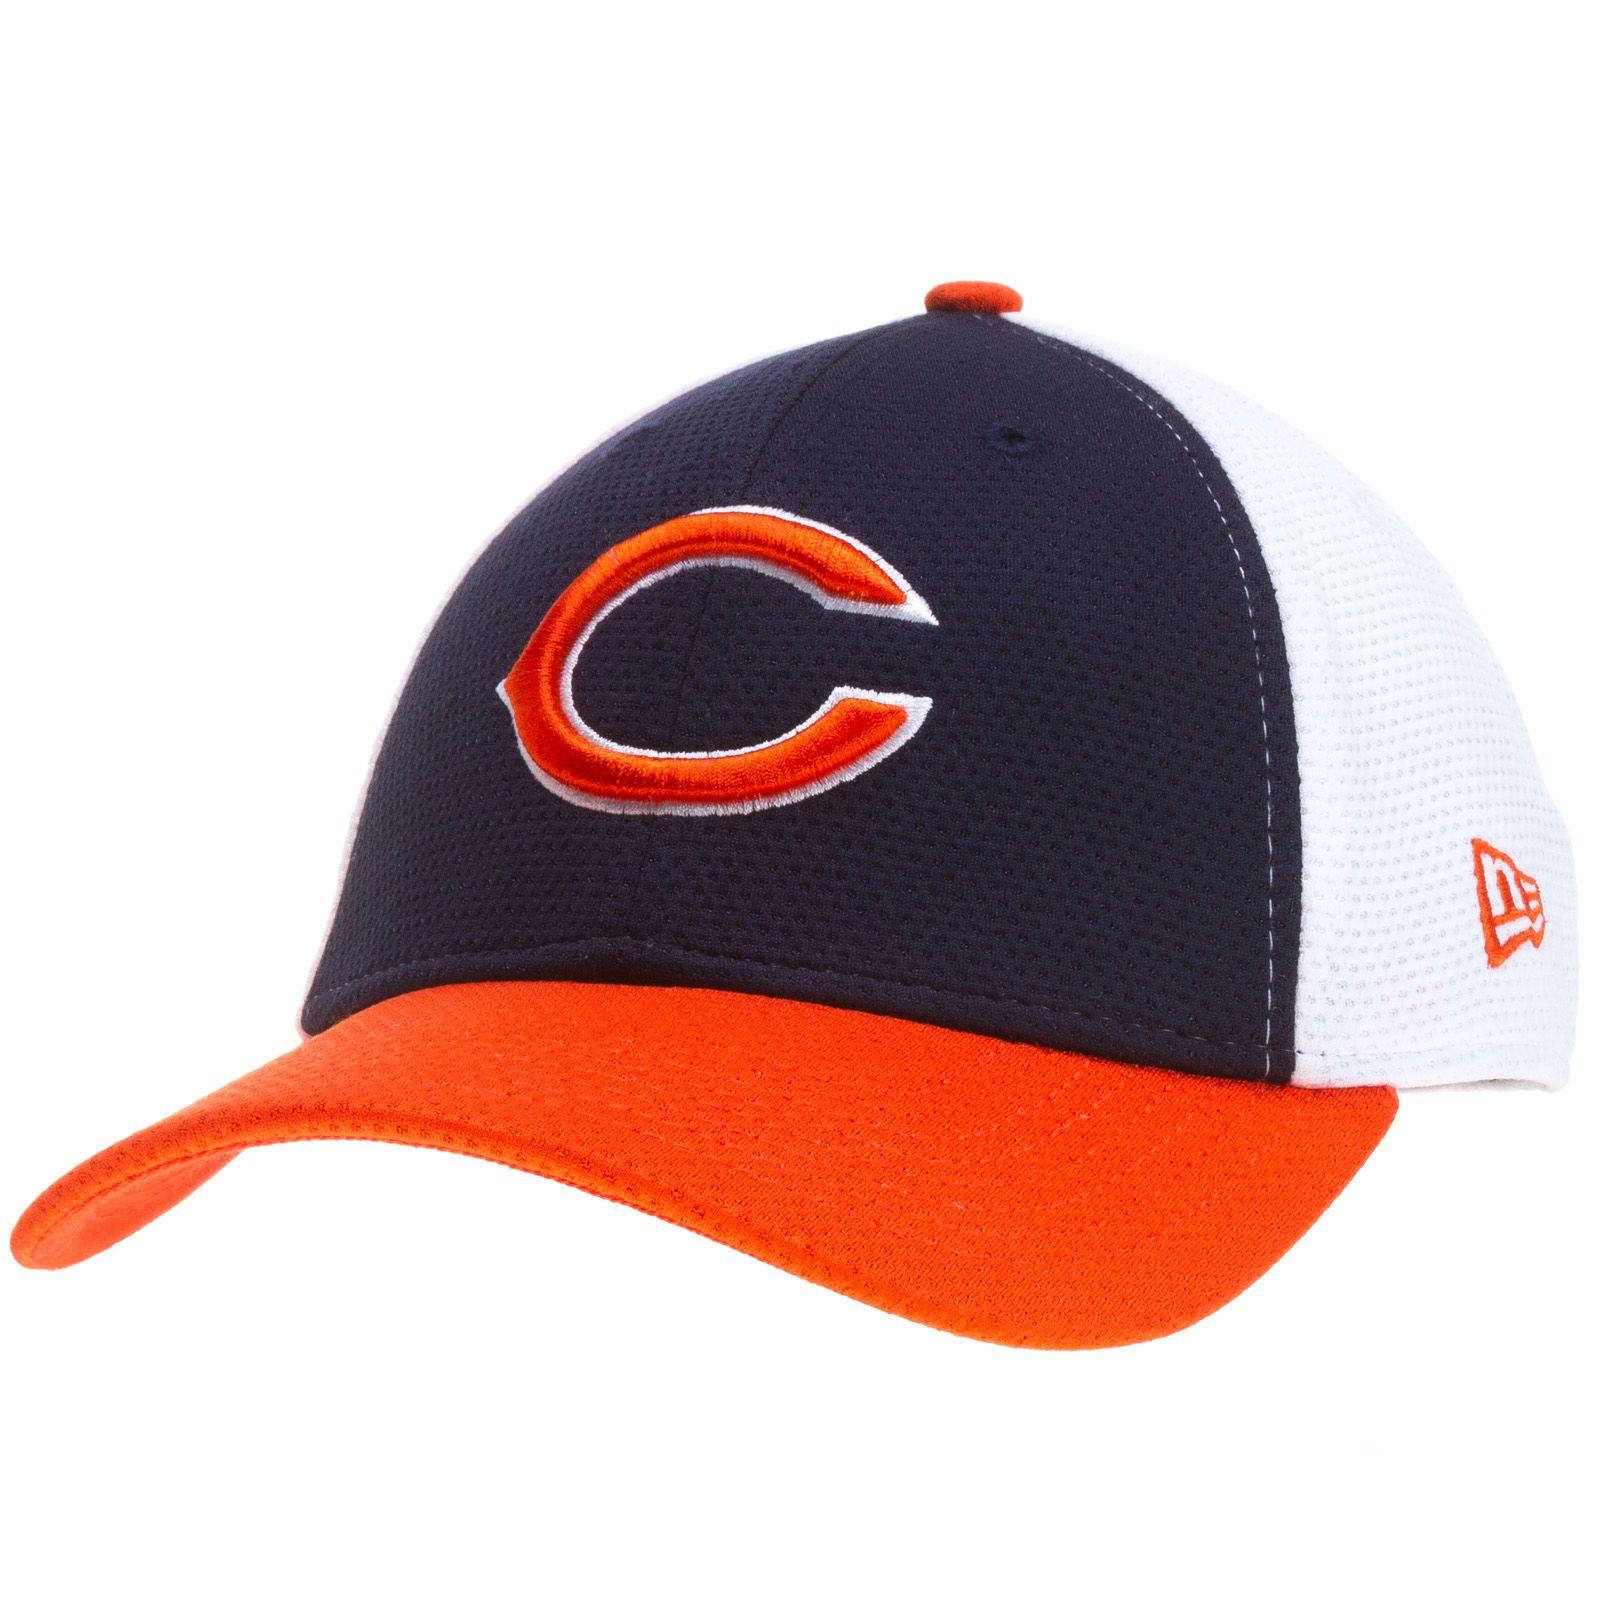 dc2c6cf1f ... ireland chicago bears tri color triple logo flex fit hat by new era  chicago e28c7 020e3